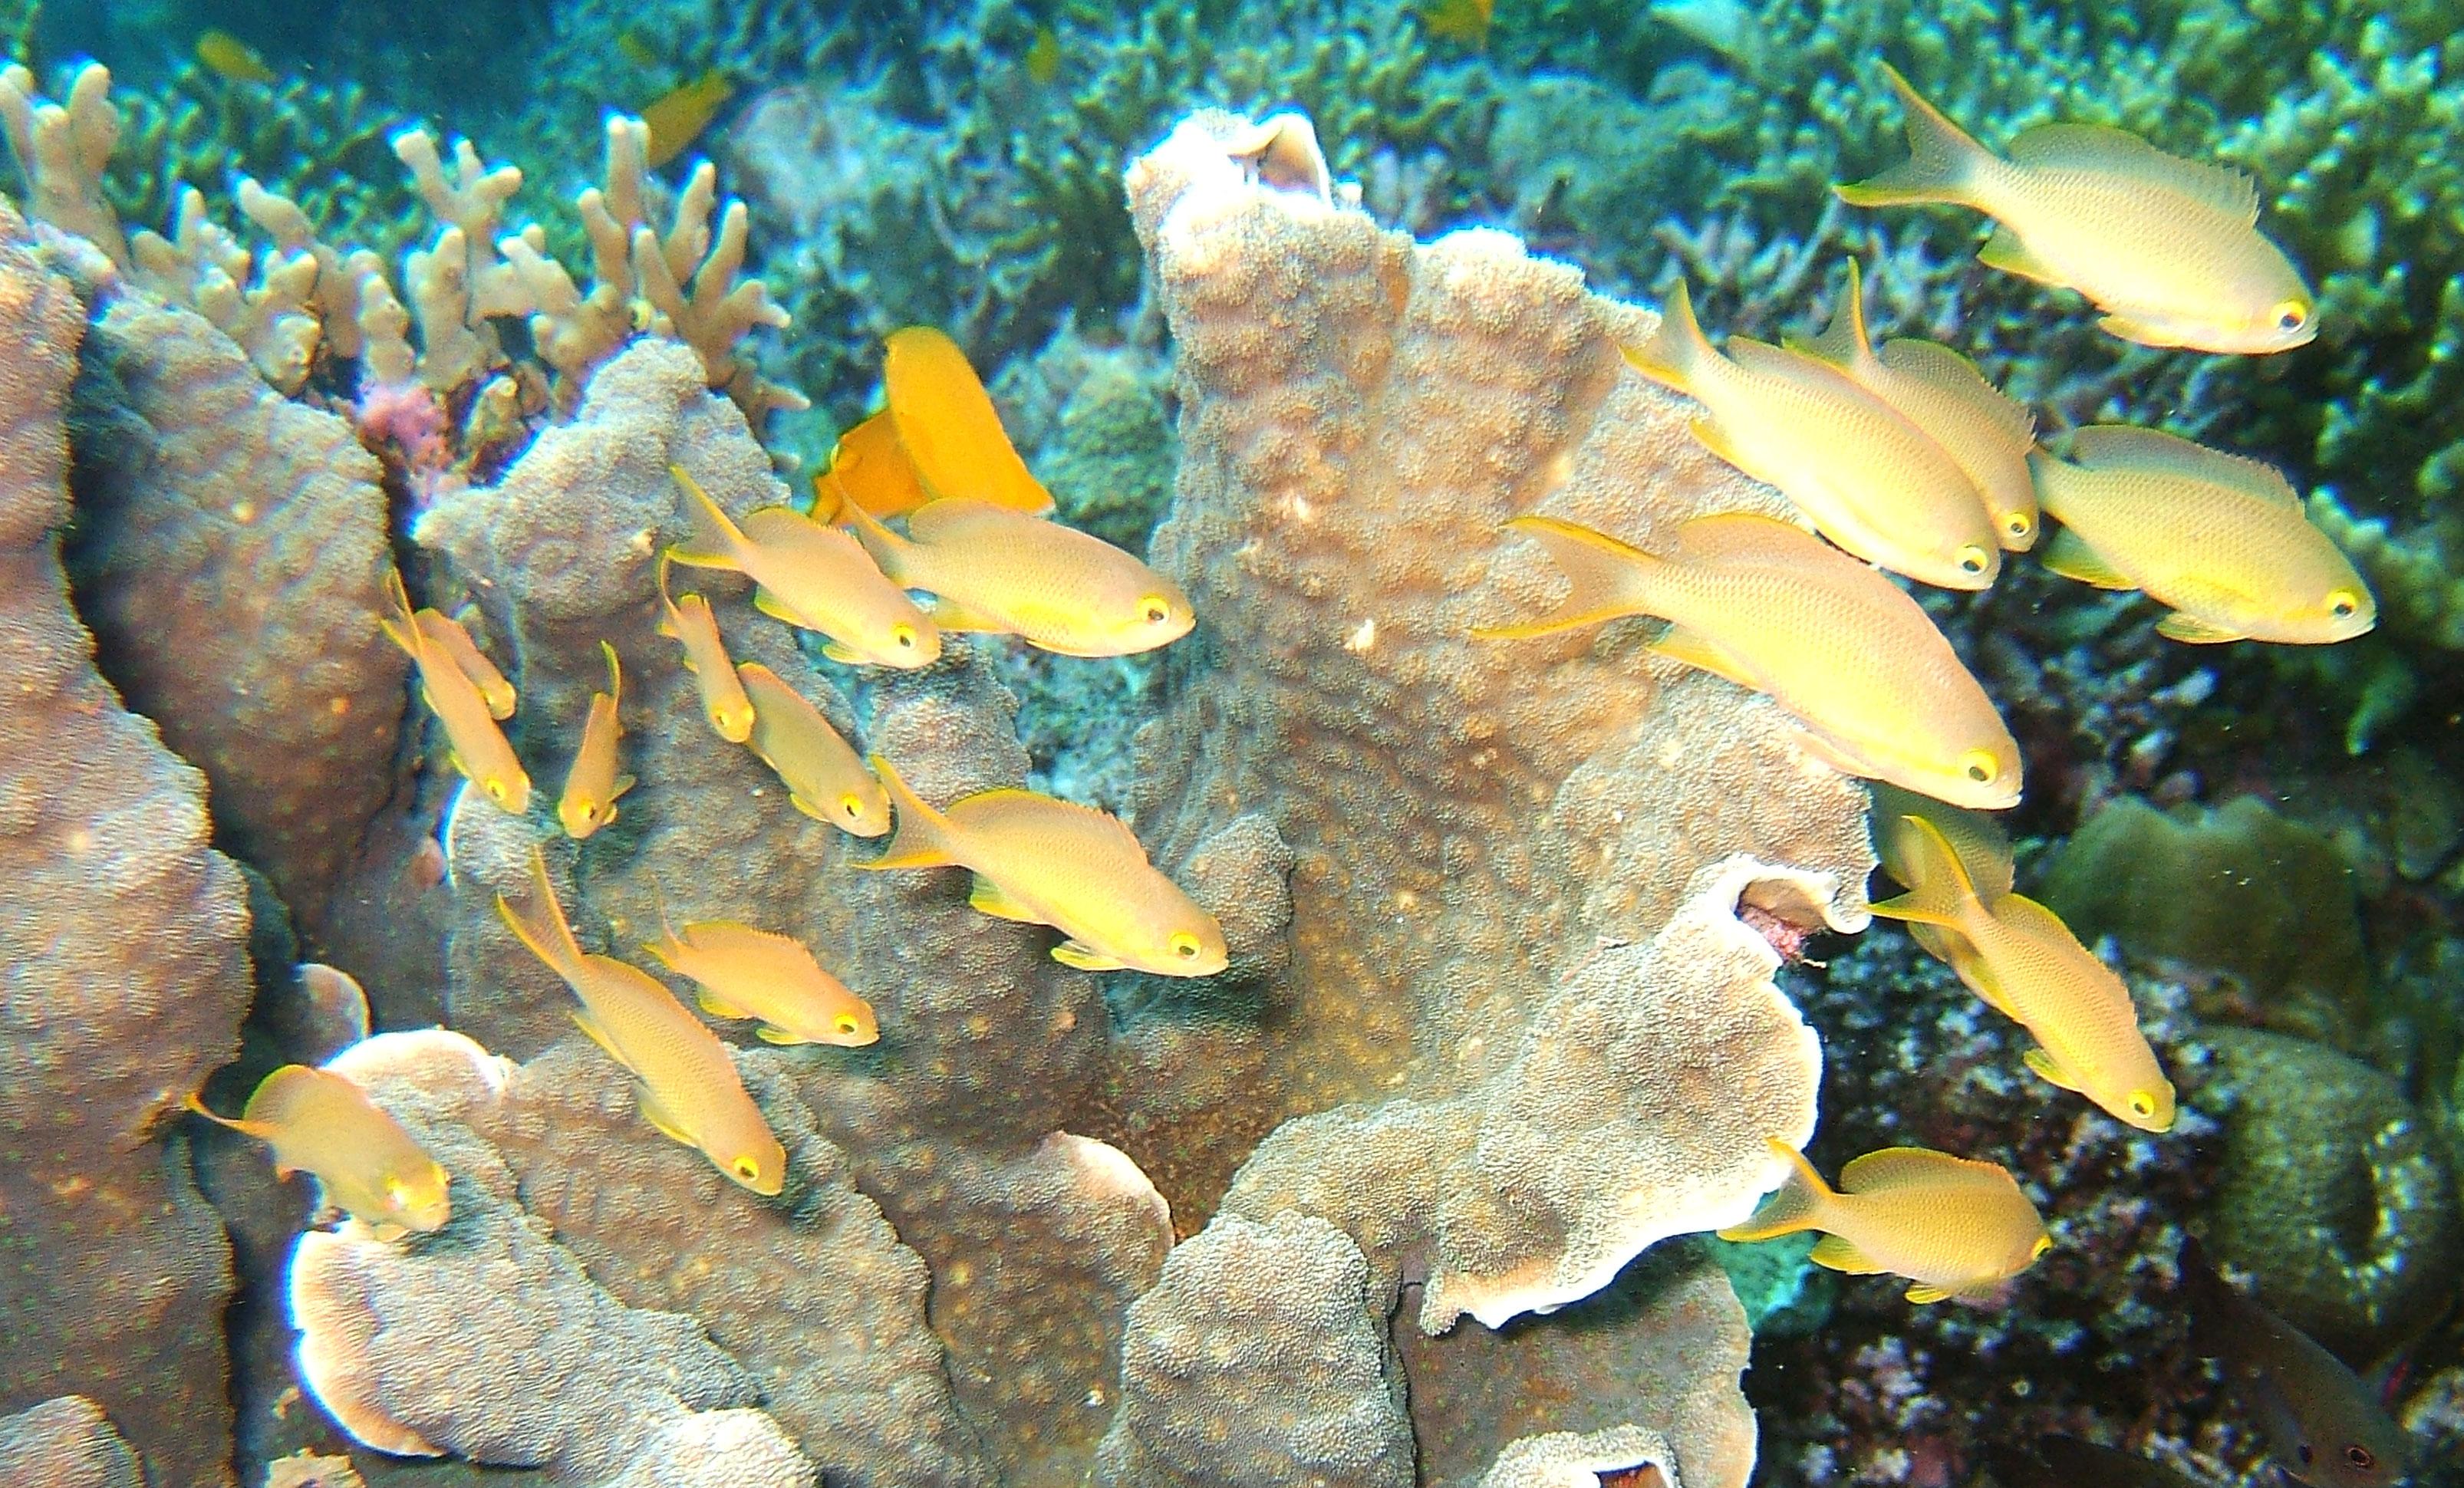 Philippines Cebu Moal Boal 20051226 Dive 1 Kasai Point 36